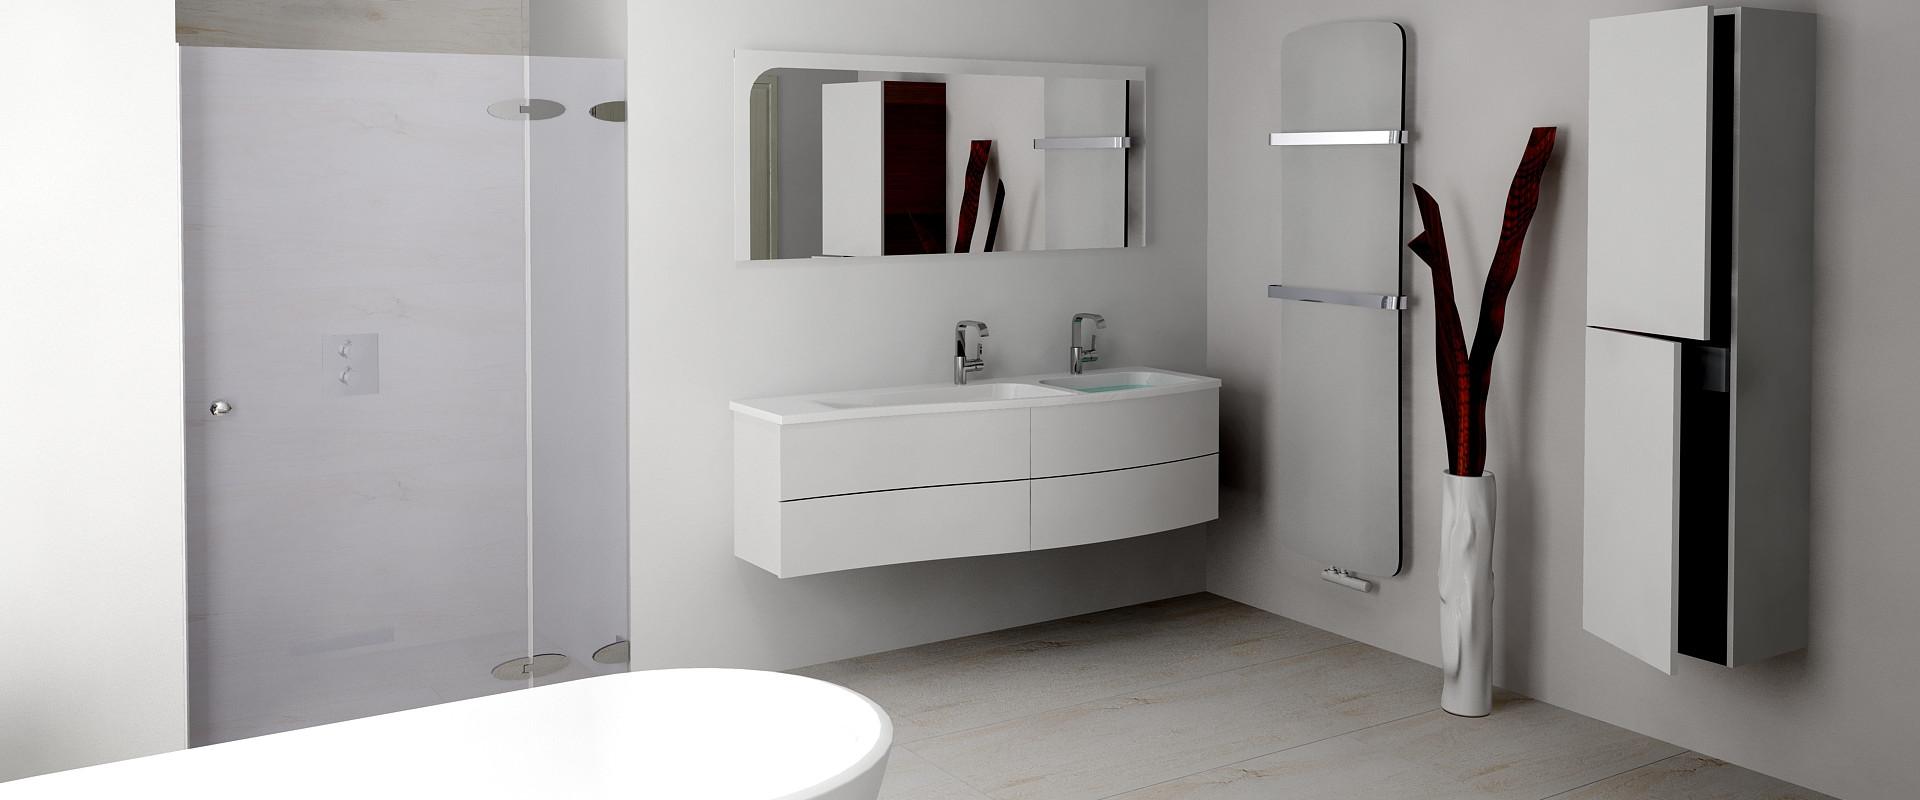 3d-badkonfigurator, Hause ideen